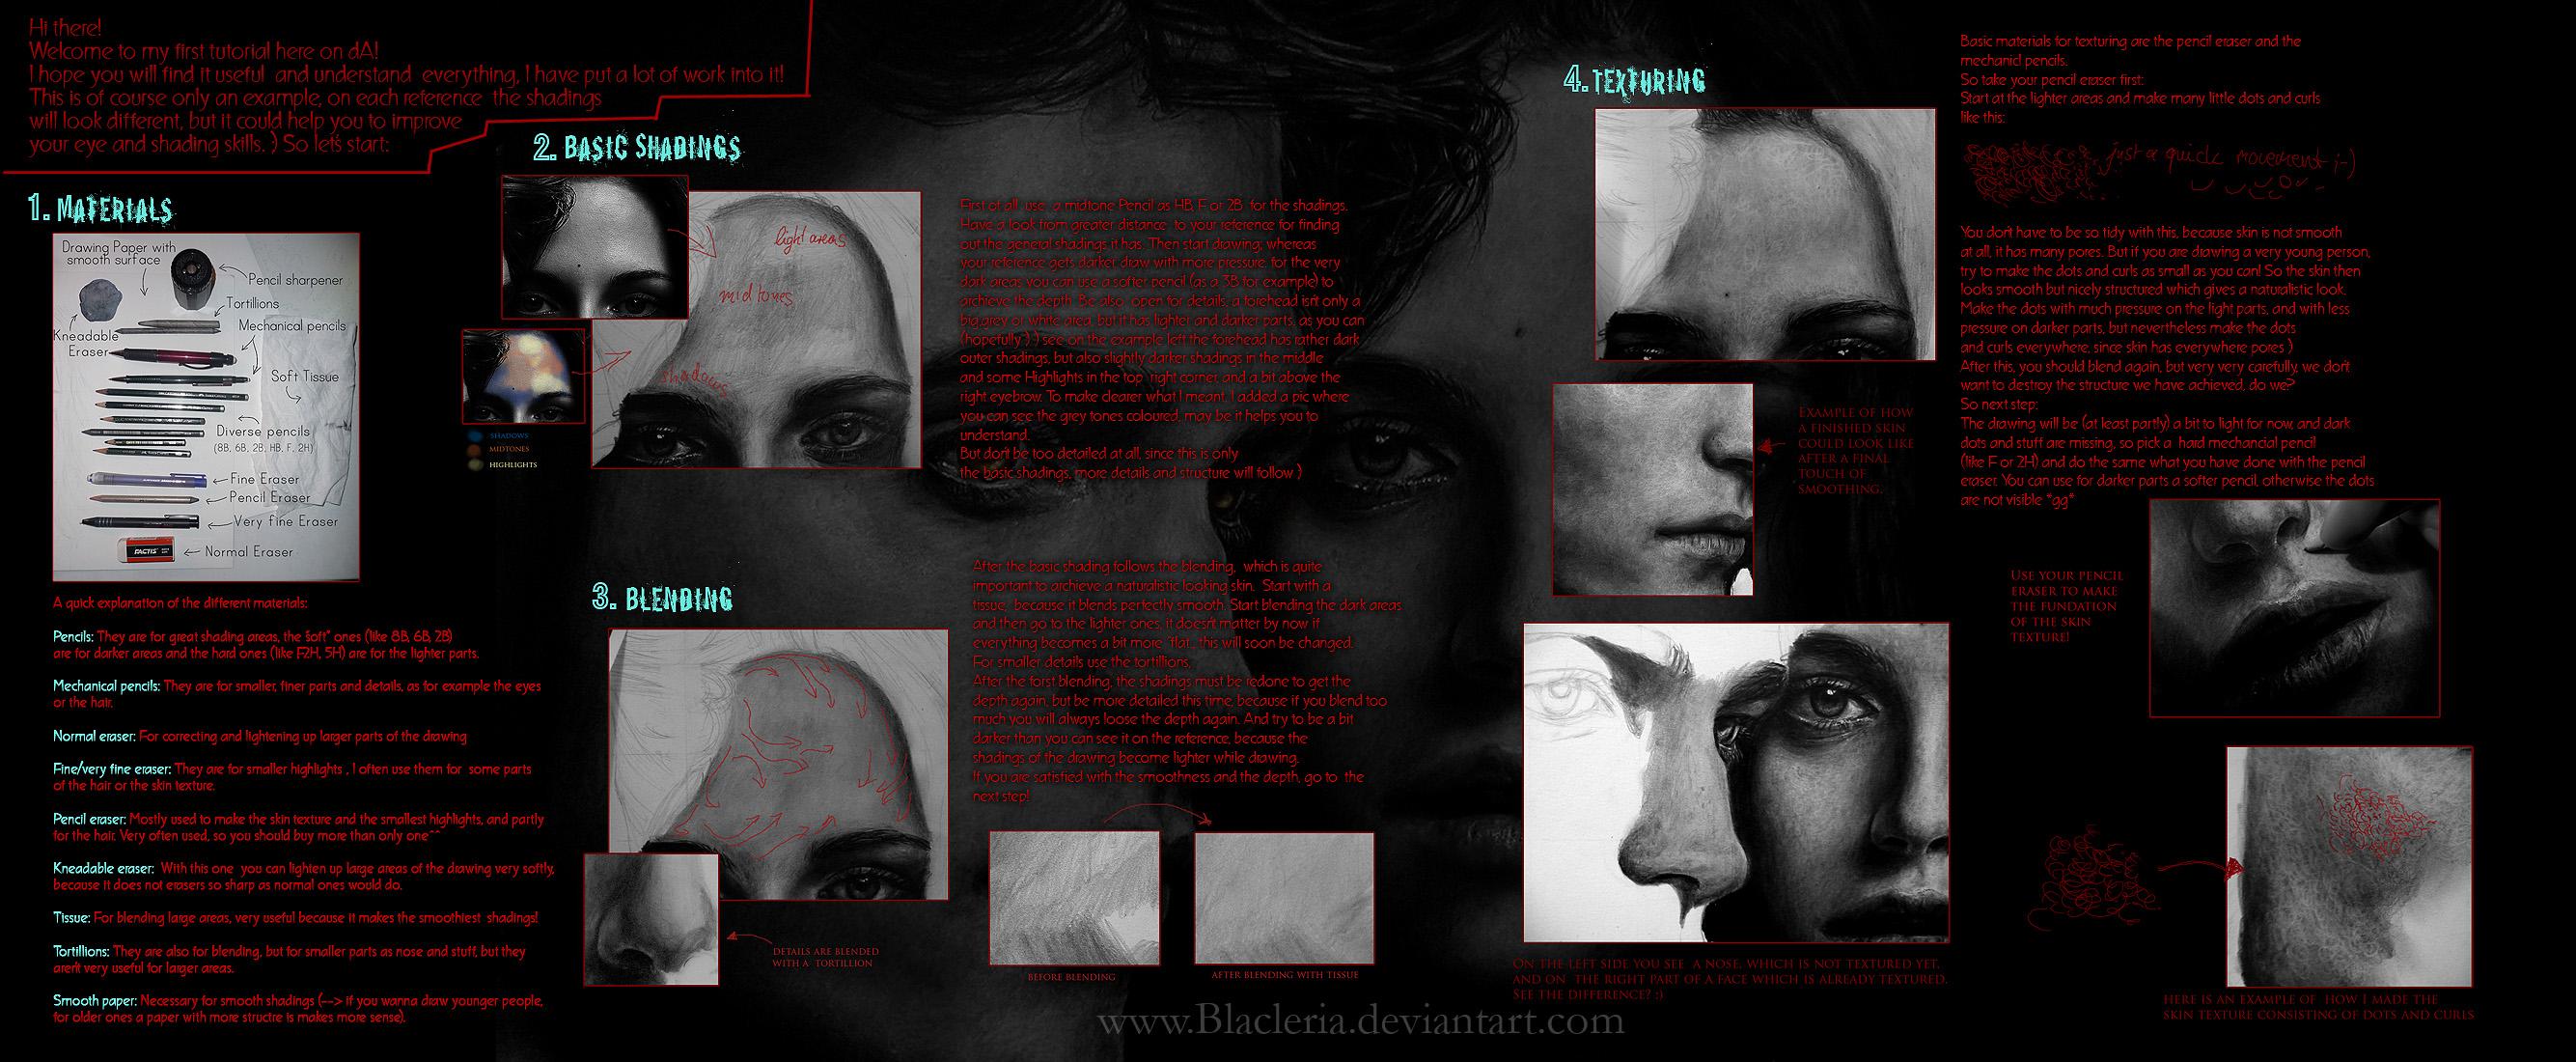 ShadingTexturing Tutorial by Blacleria